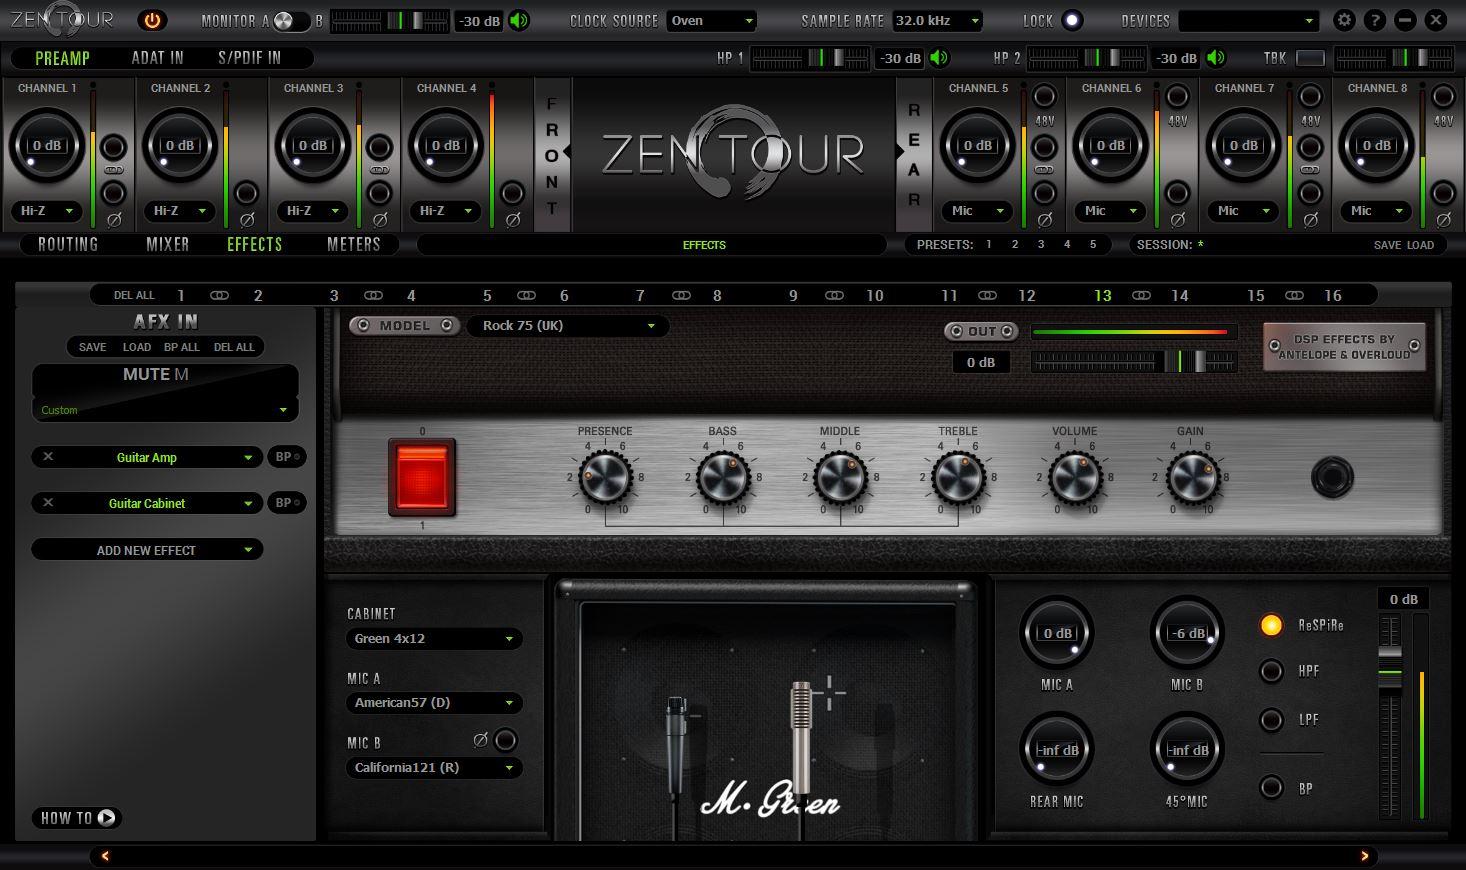 Antelope Audio Zen Tour Channel Interface Reviews